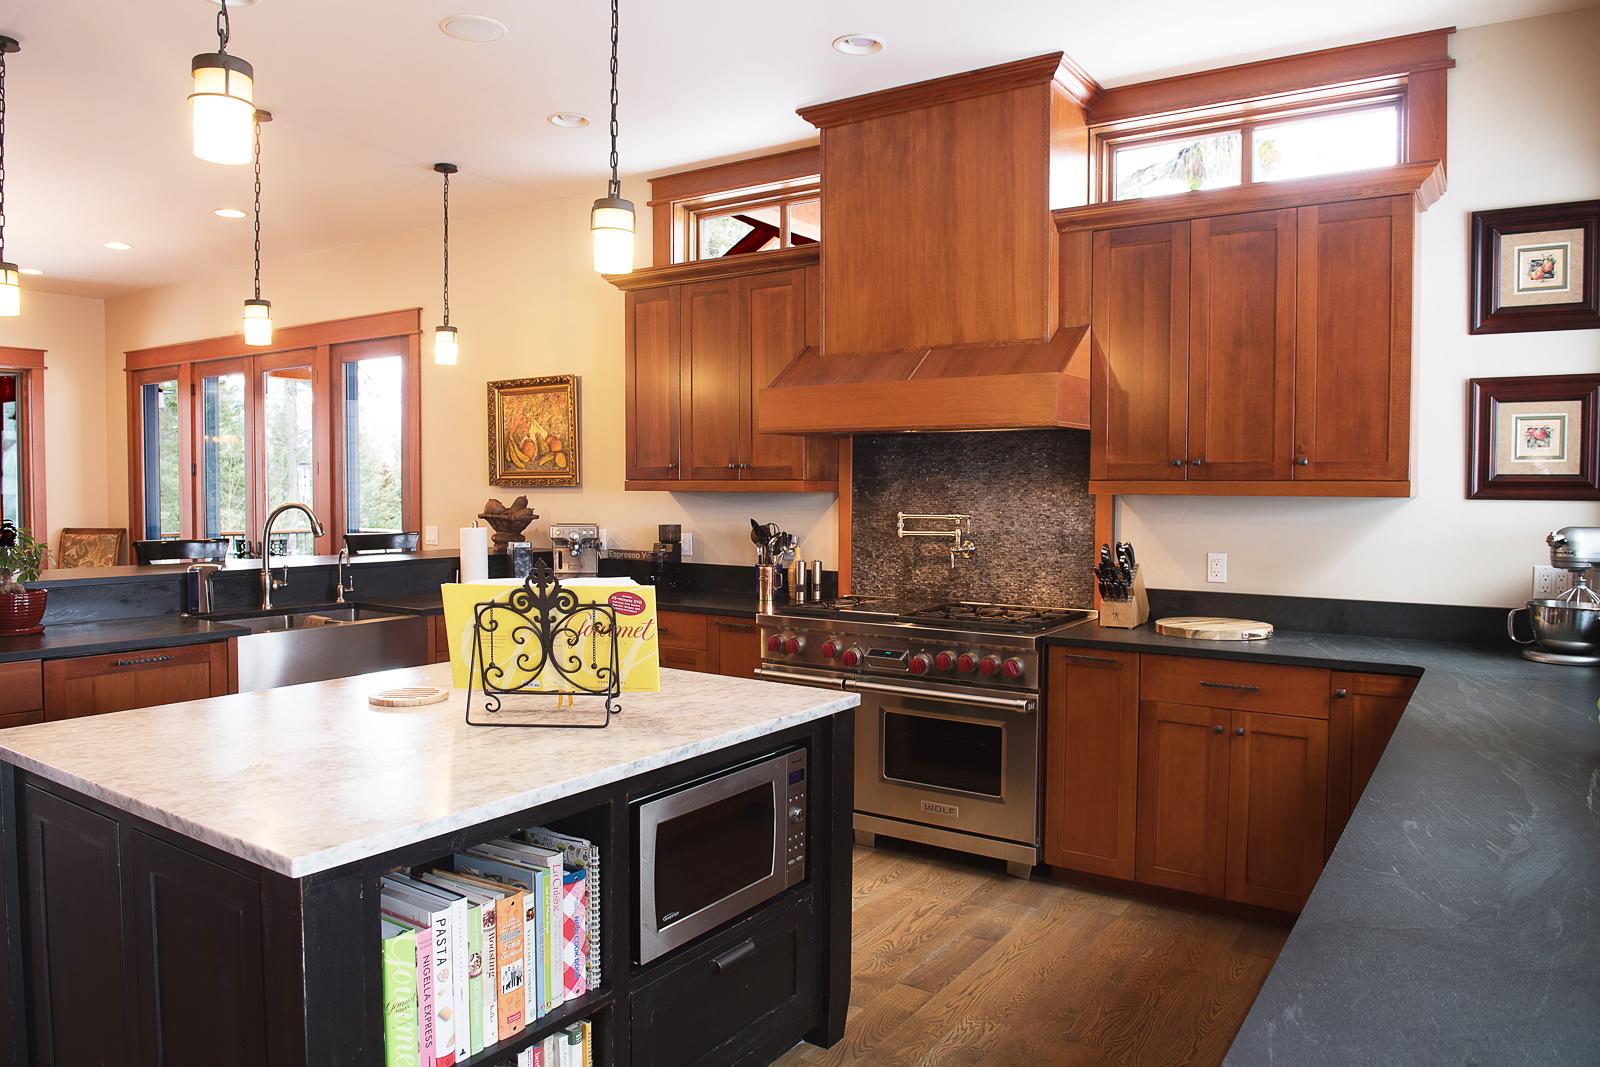 Woodworks-West-Bozeman-Montana-Builder-Cabinetry-Remodel-New-Construction-3548.jpg